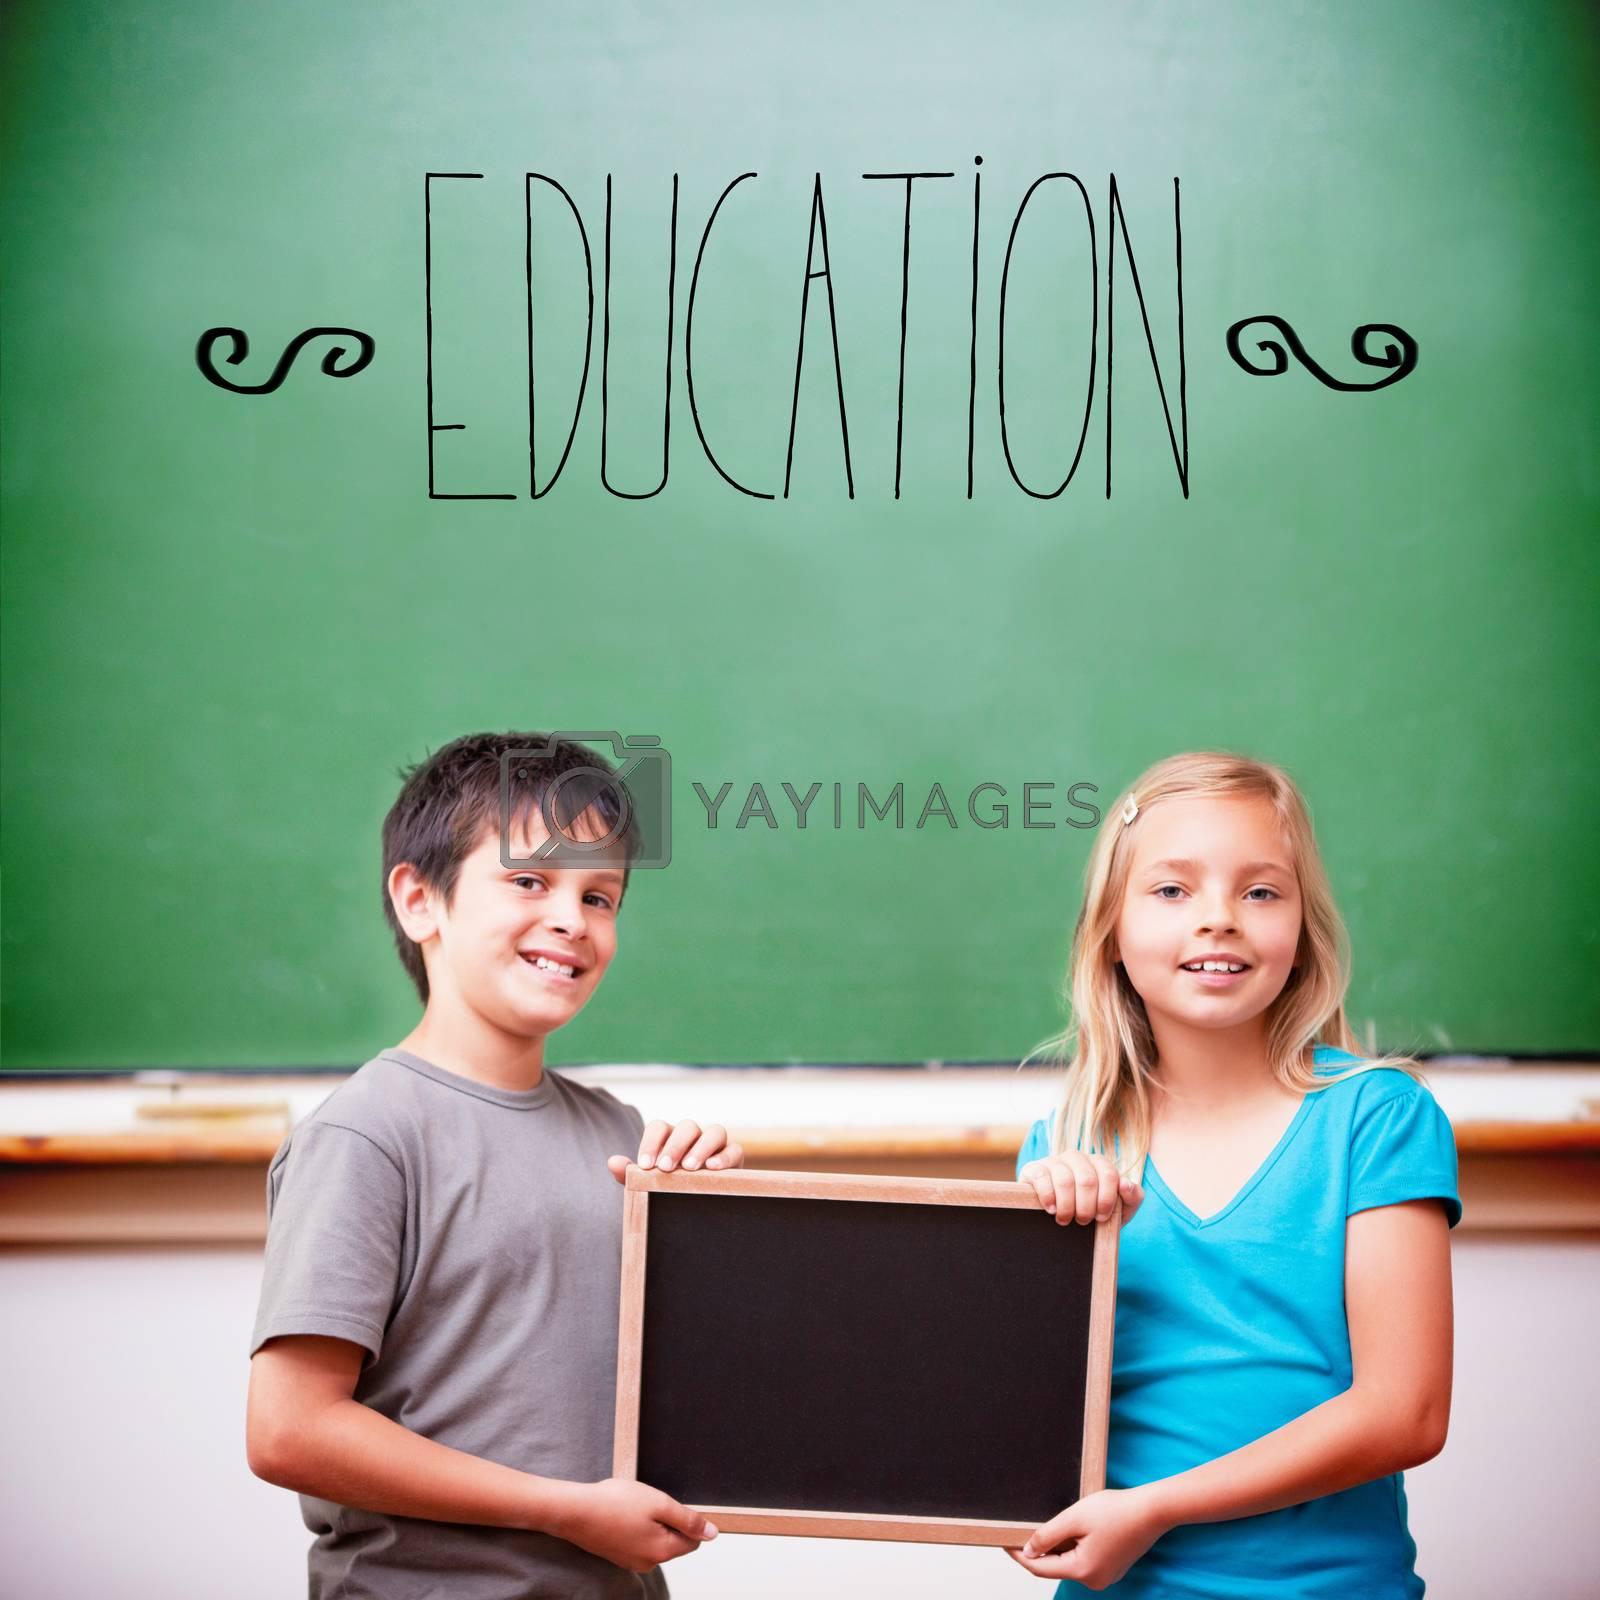 Education against cute pupils showing chalkboard by Wavebreakmedia